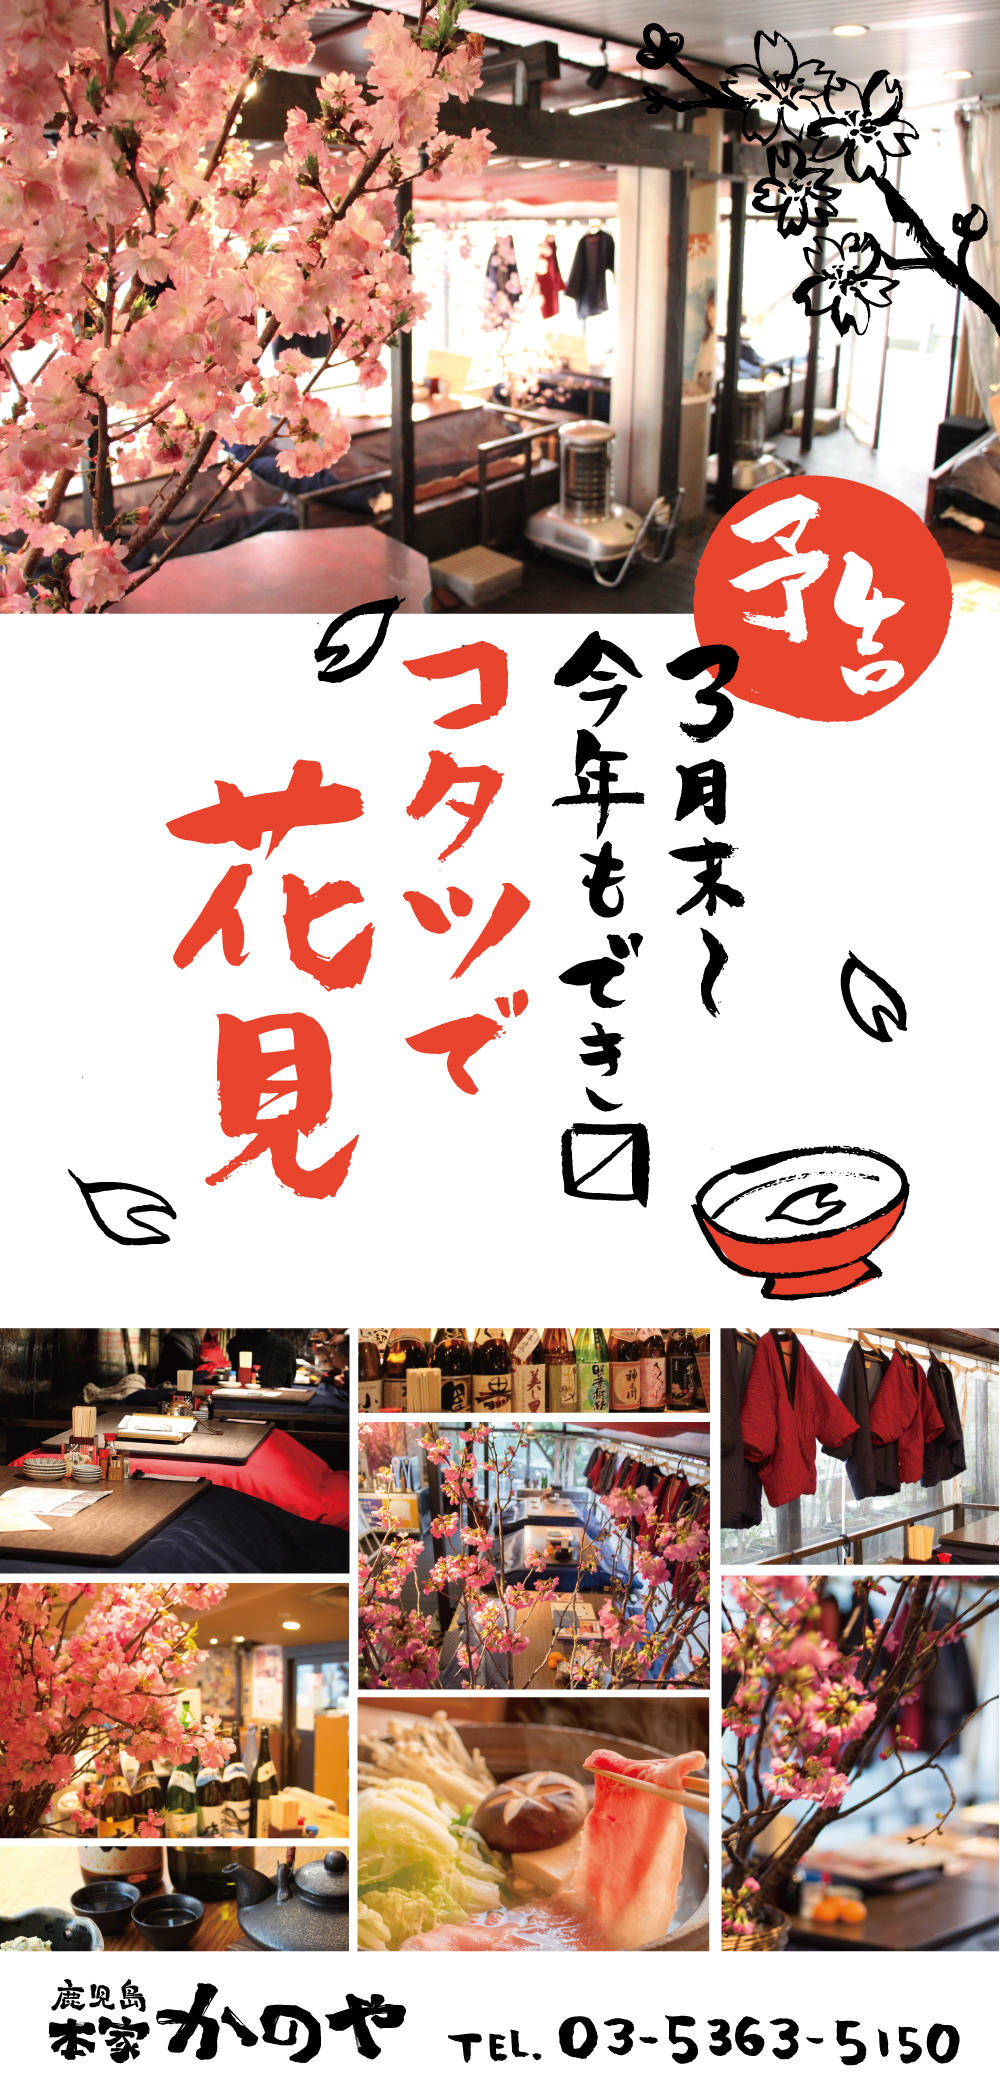 kanoya_1803_sakura.jpg